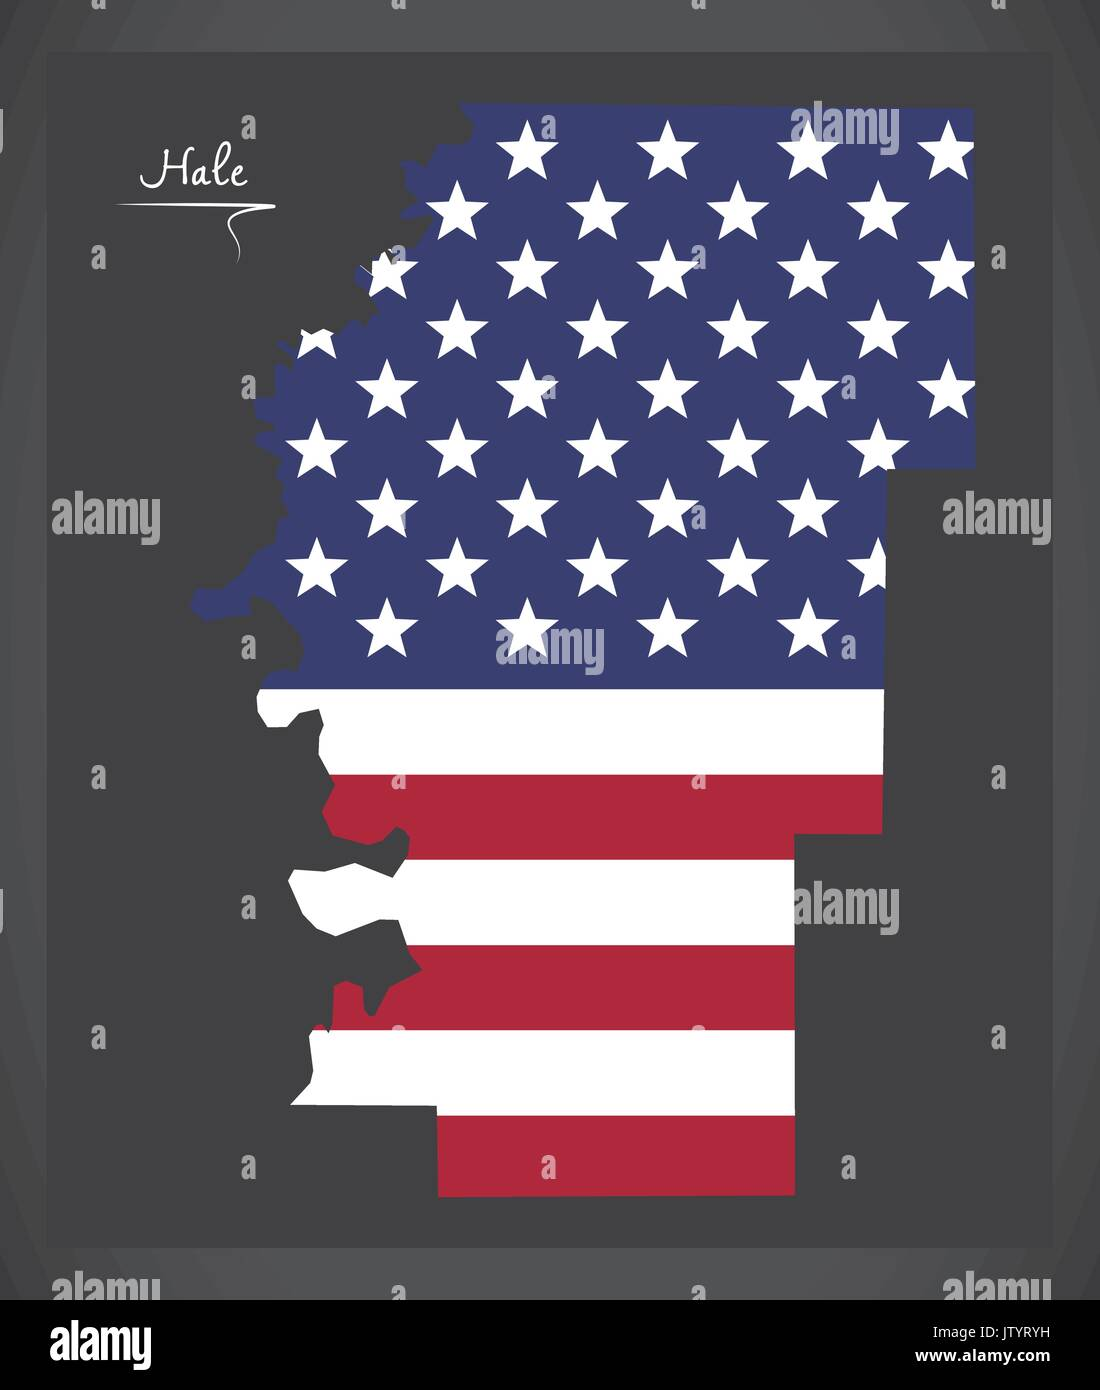 Hale County Map Of Alabama Usa With American National Flag Stock